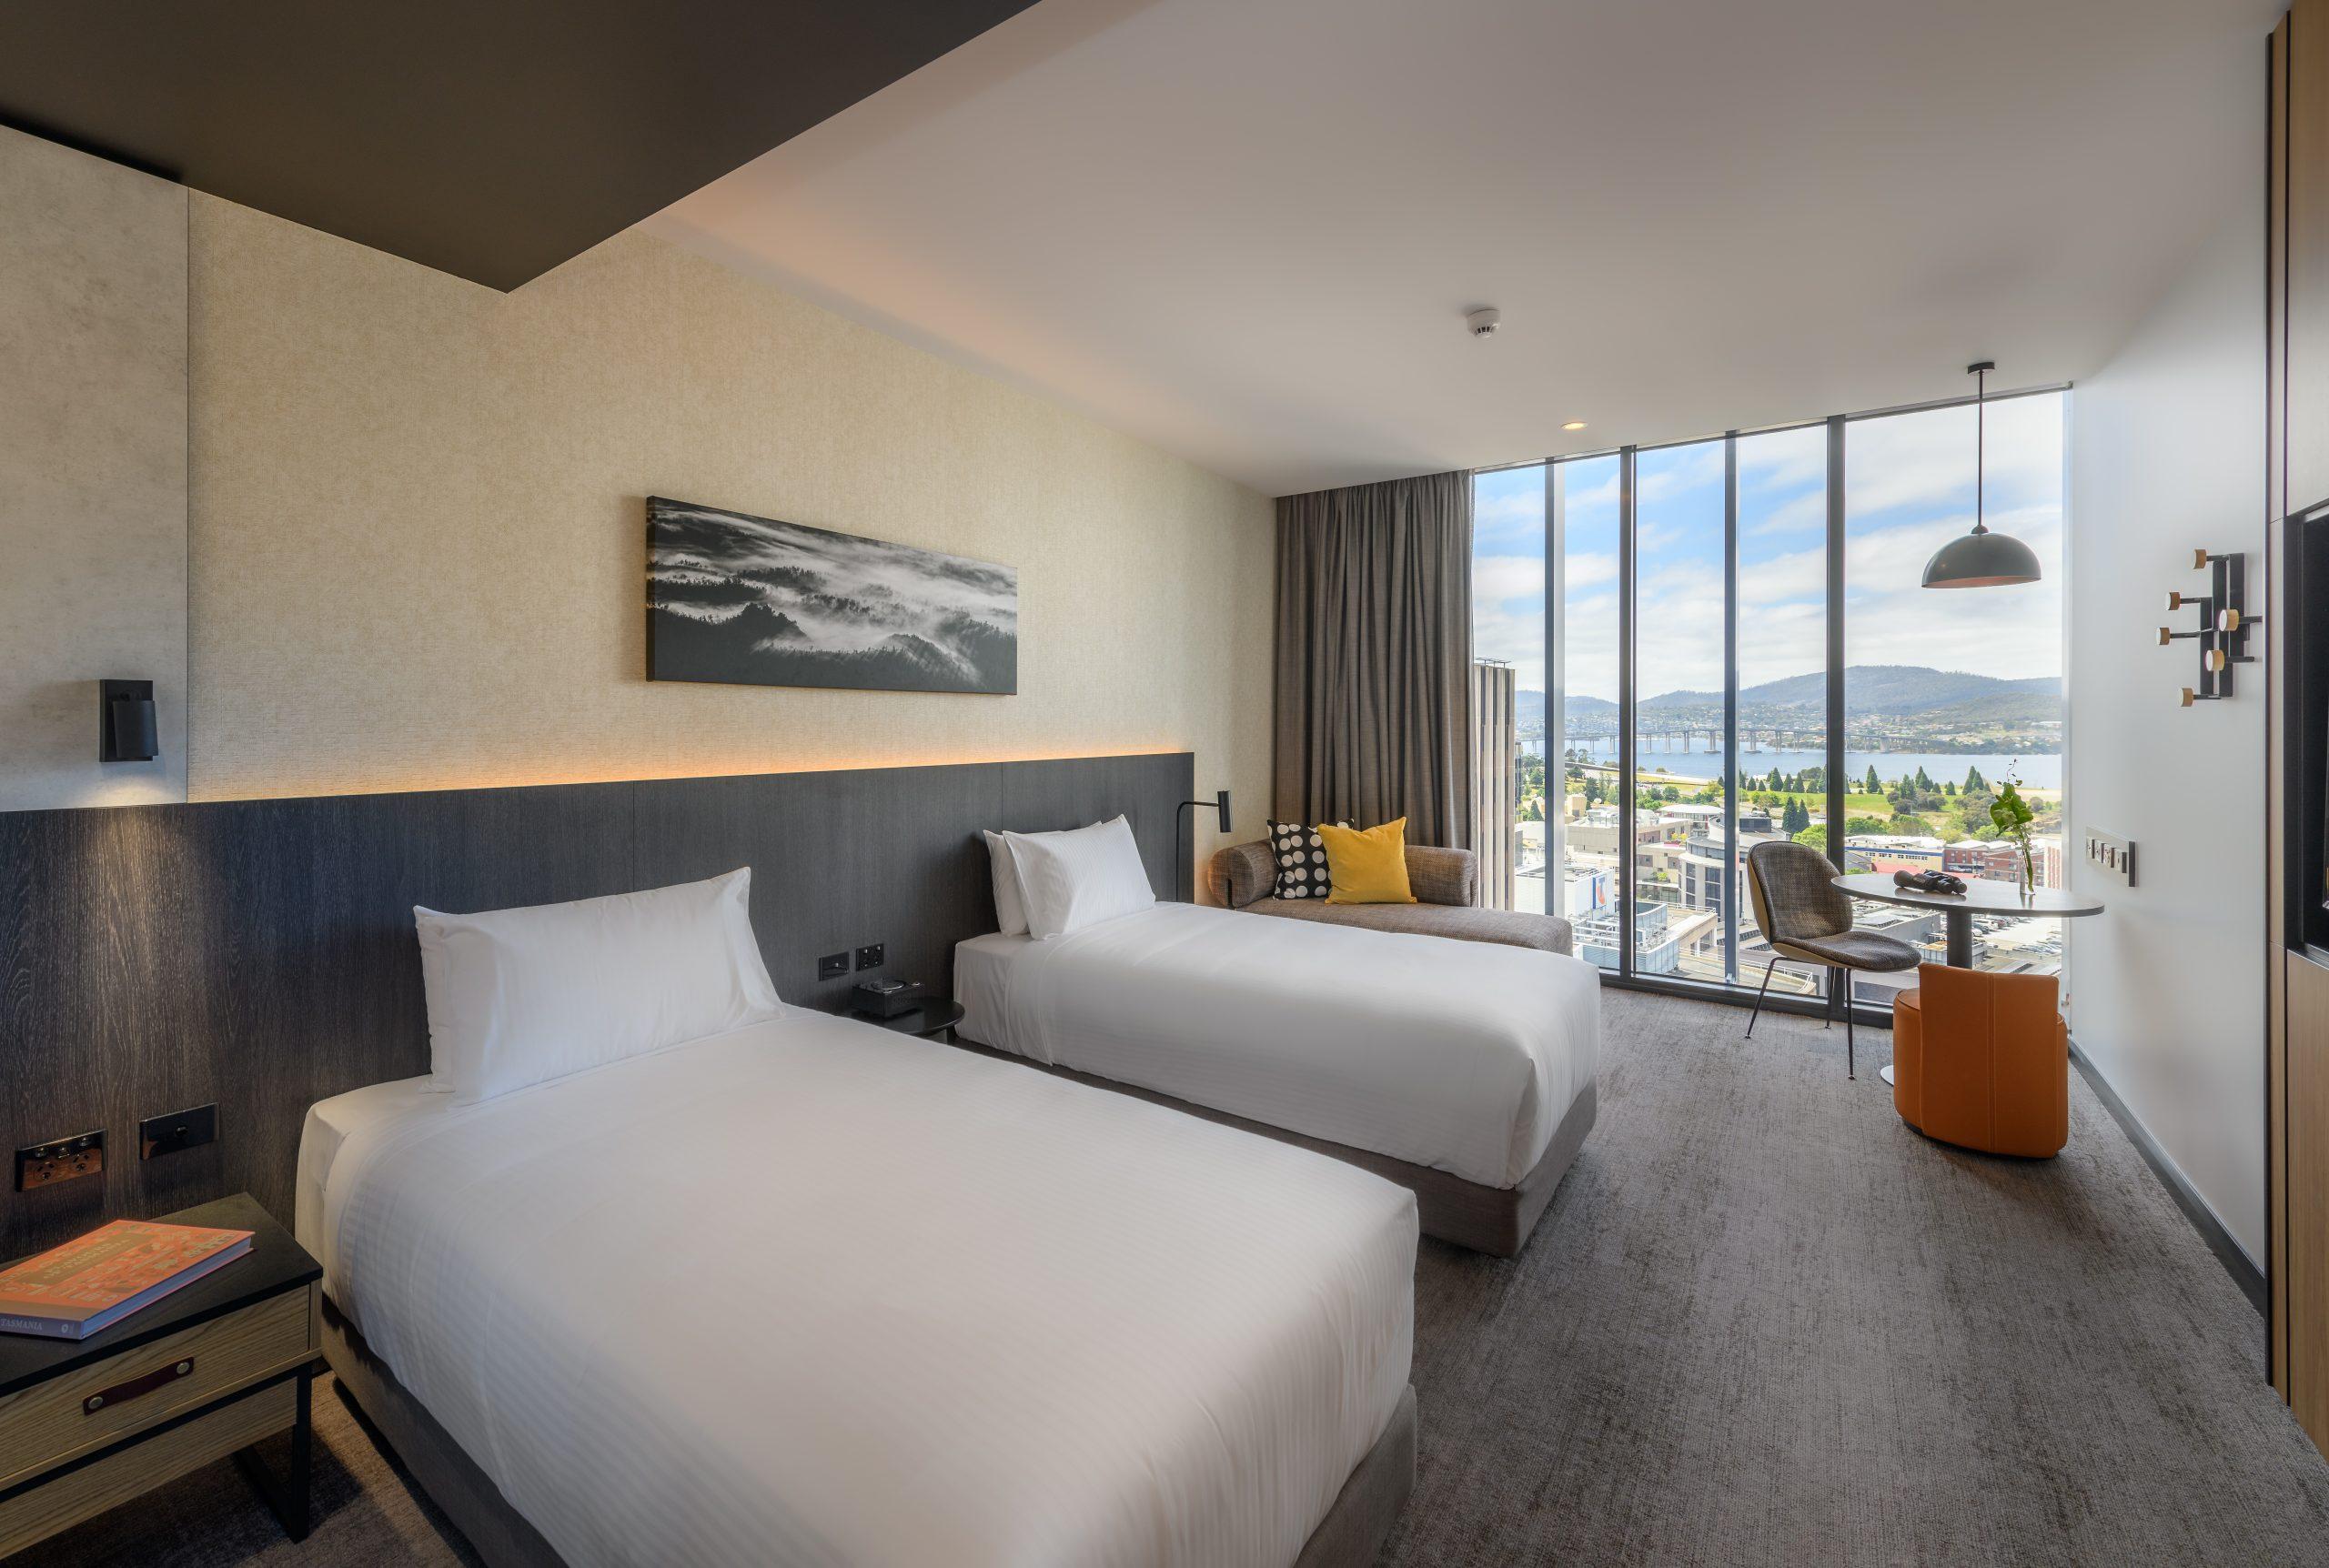 Movenpick Hotel Hobart-LLG_9954-HDR